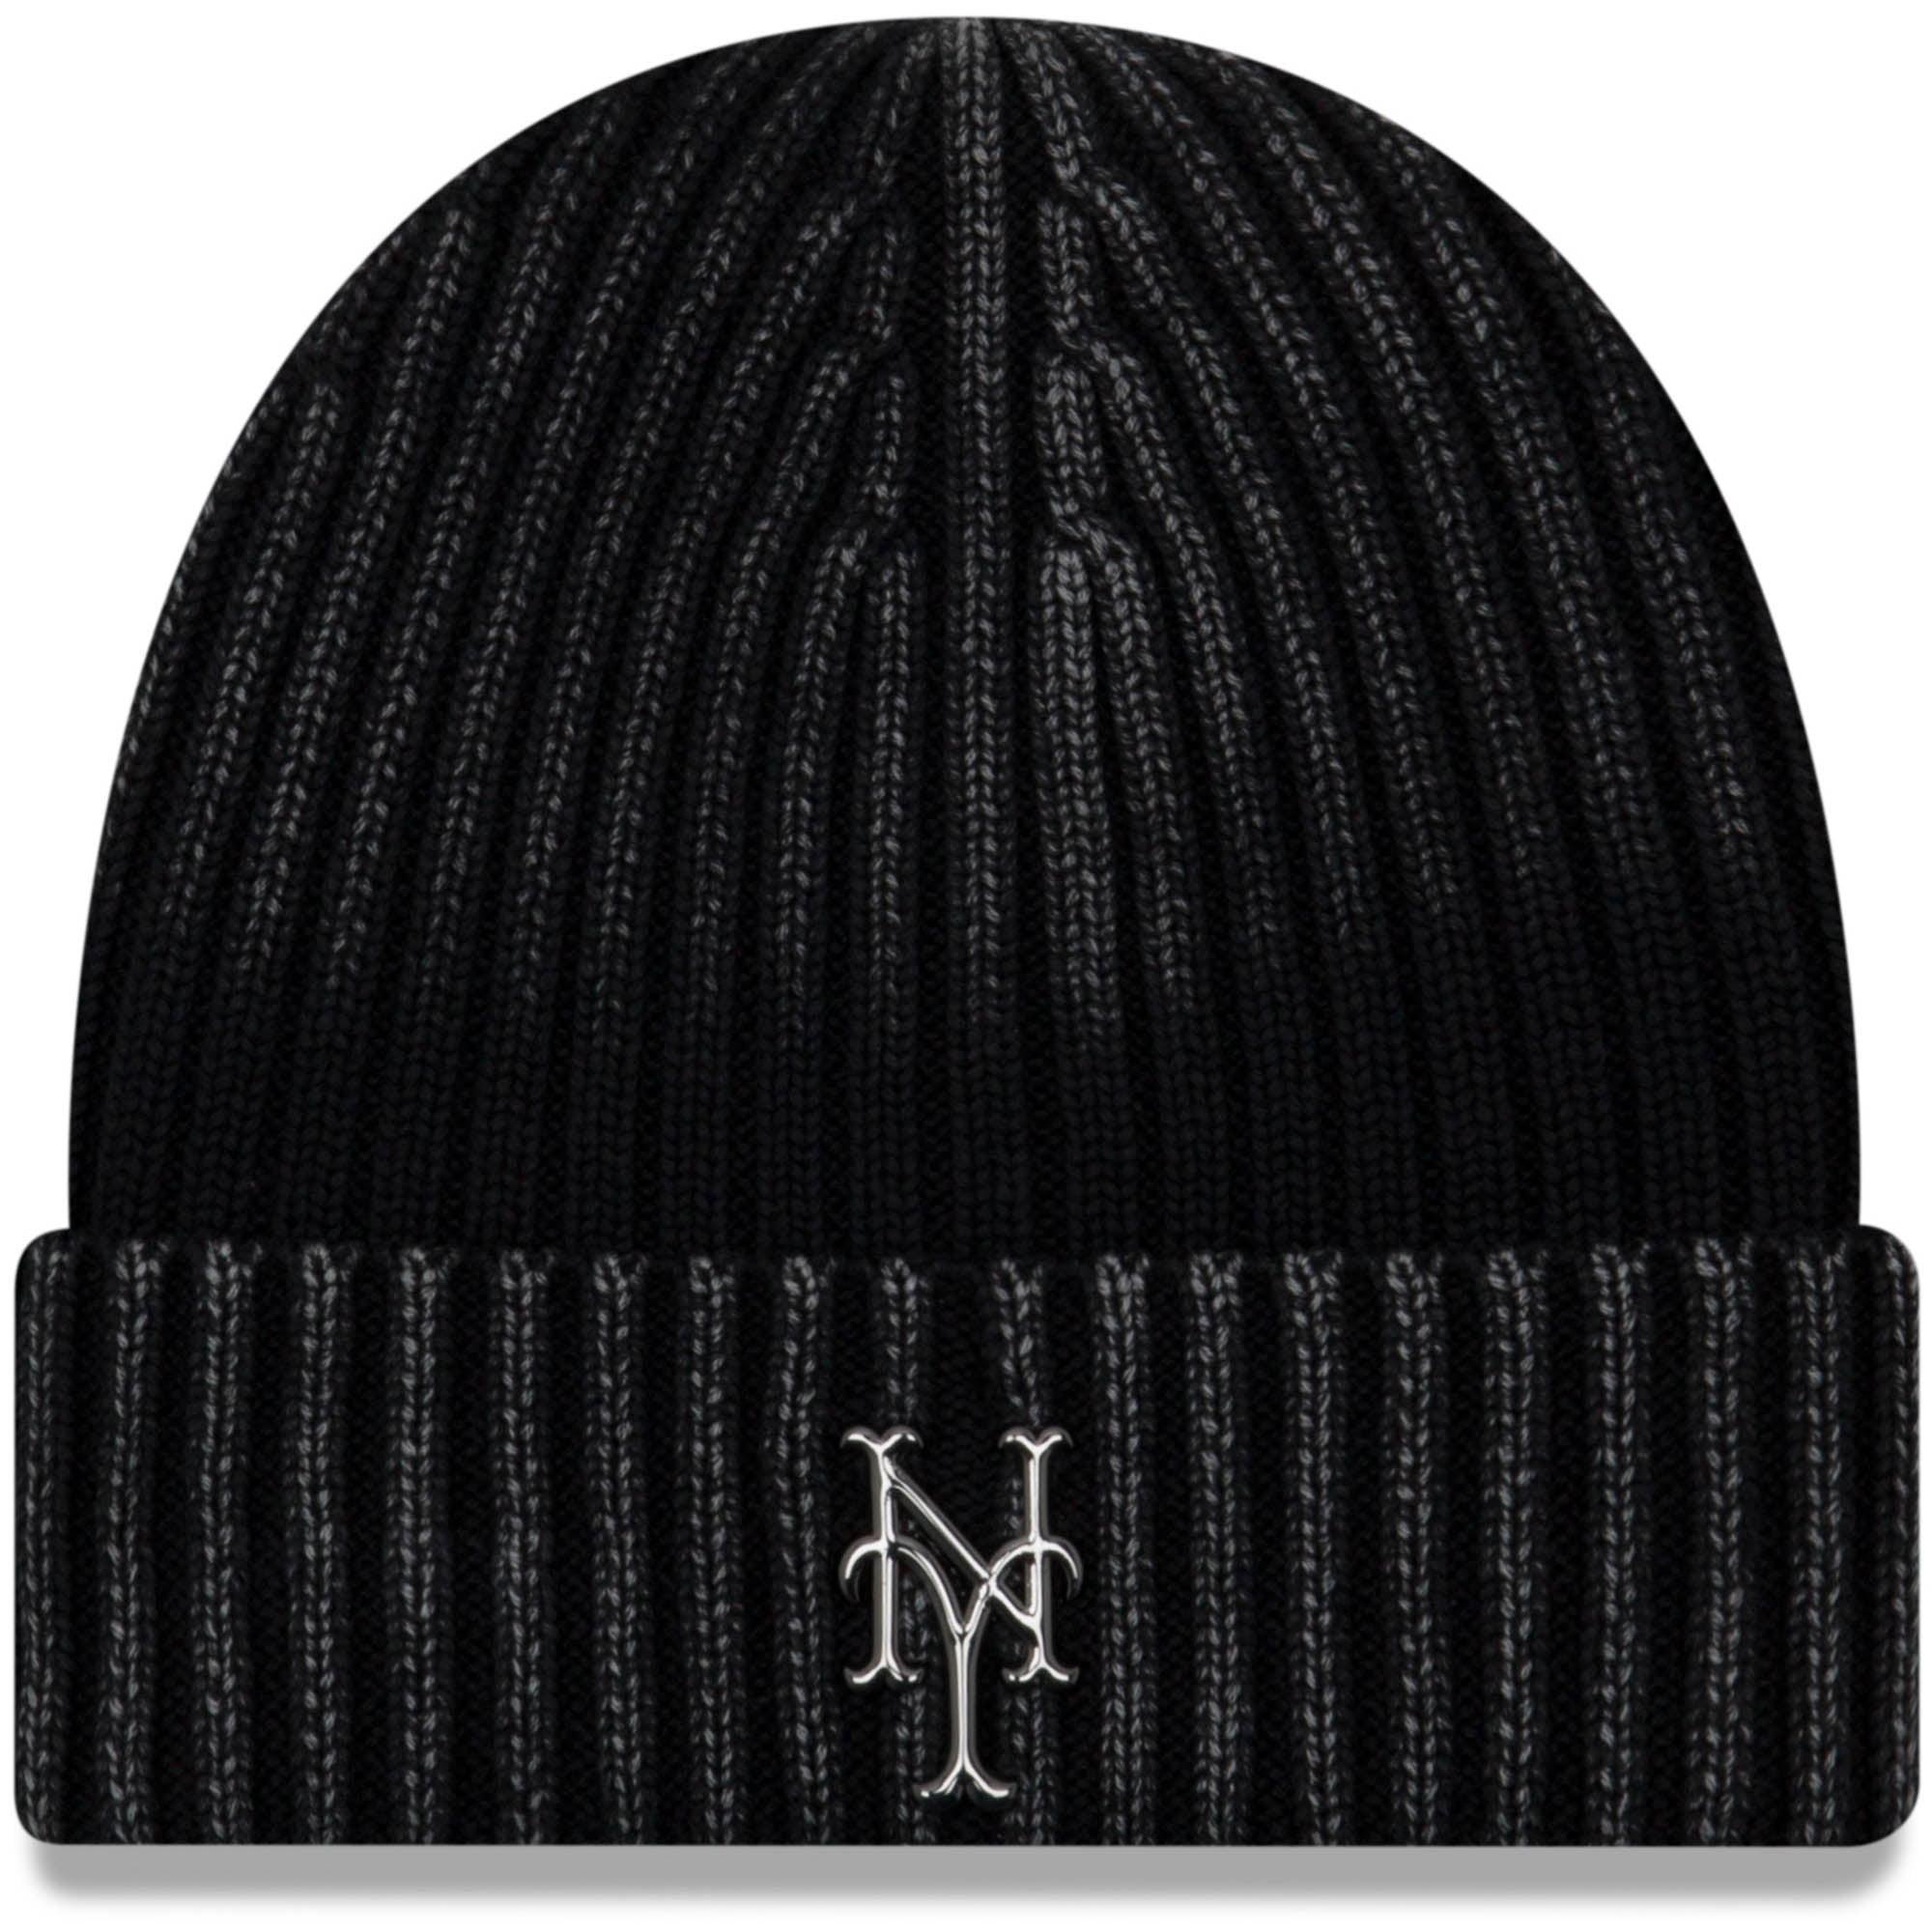 New York Mets New Era Winter Wind Cuffed Knit Hat Black OSFA by NEW ERA CAP COMPANY